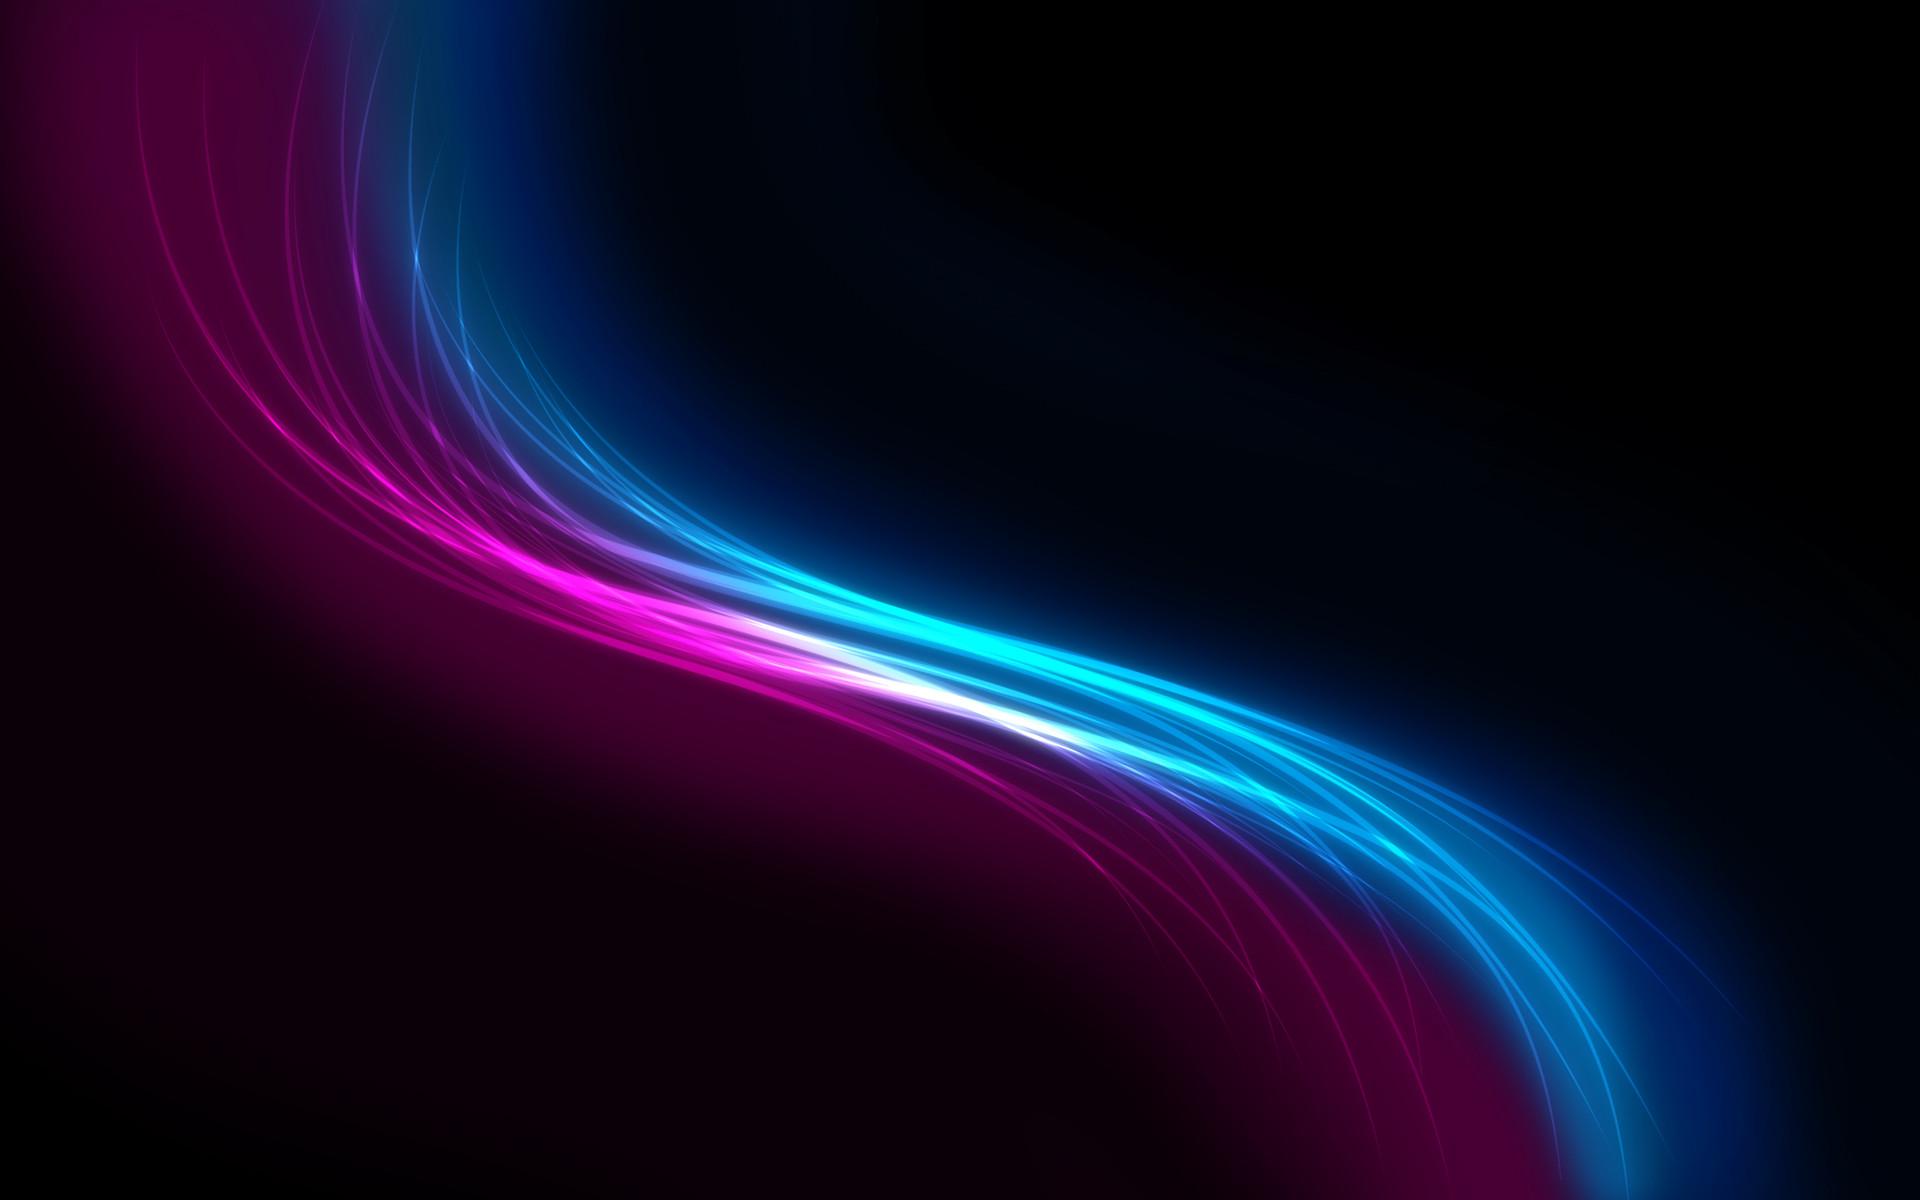 background, swirl, privacy, scenic, blue, policy, purple, image .